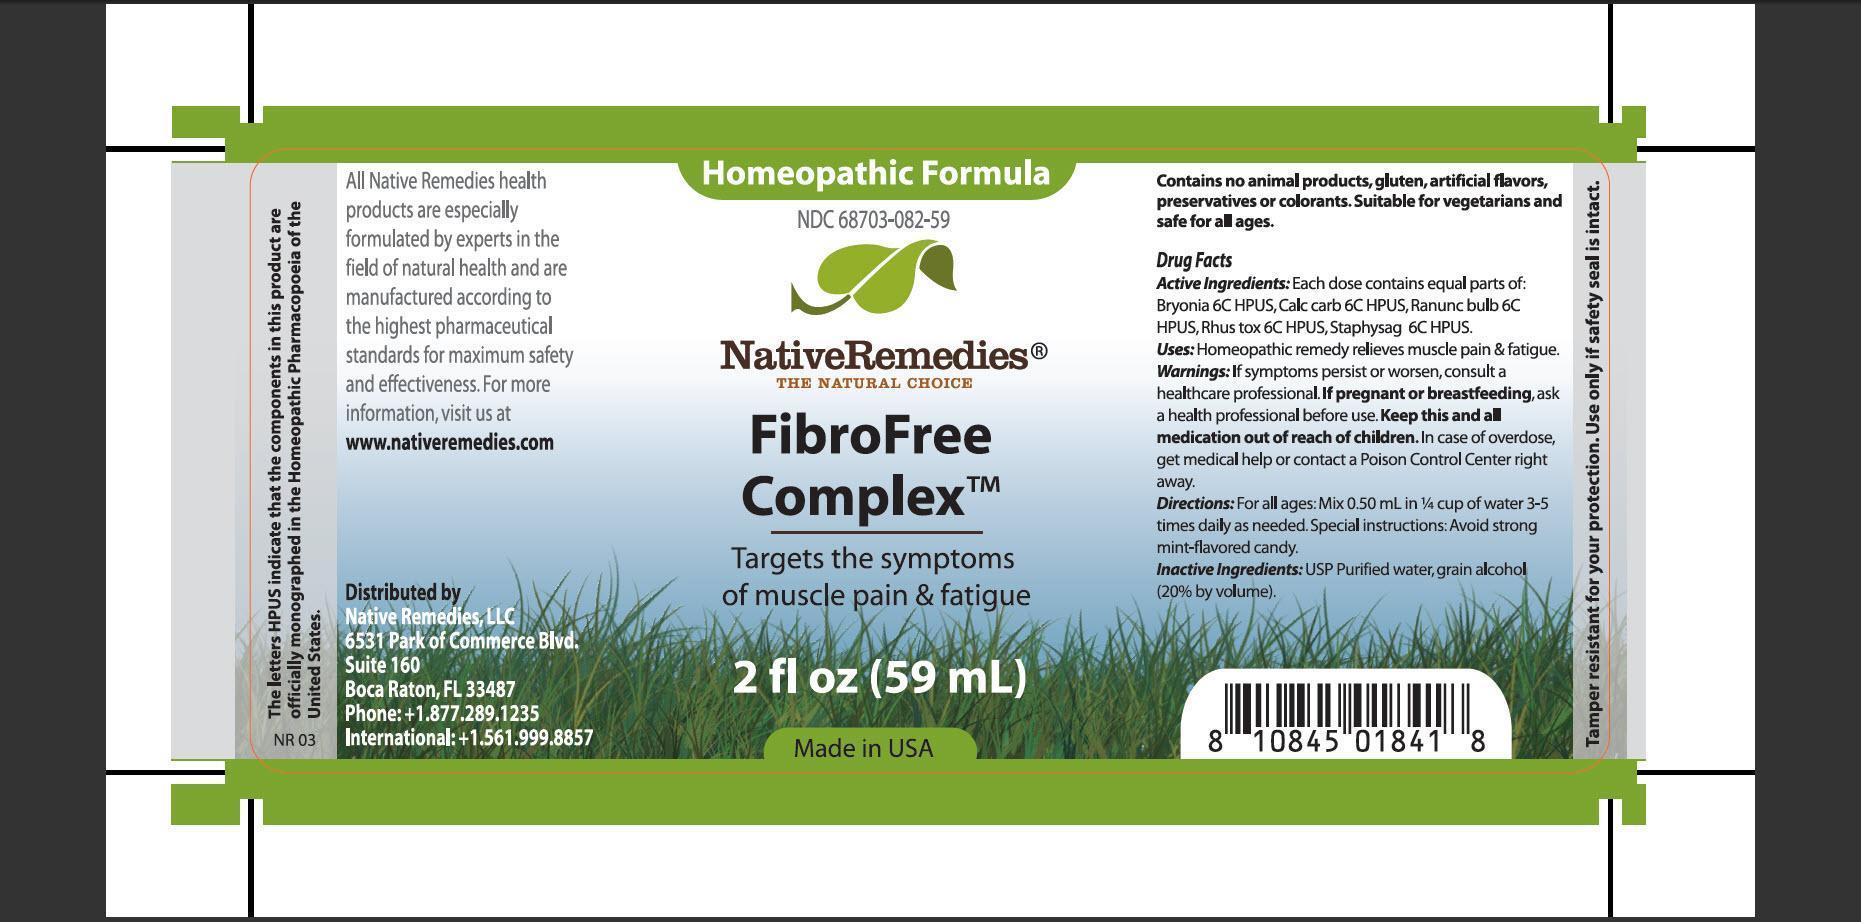 Fibrofree Complex (Bryonia, Calc Carb, Ranunc Bulb, Rhus Tox, Staphysag) Tincture [Native Remedies, Llc]